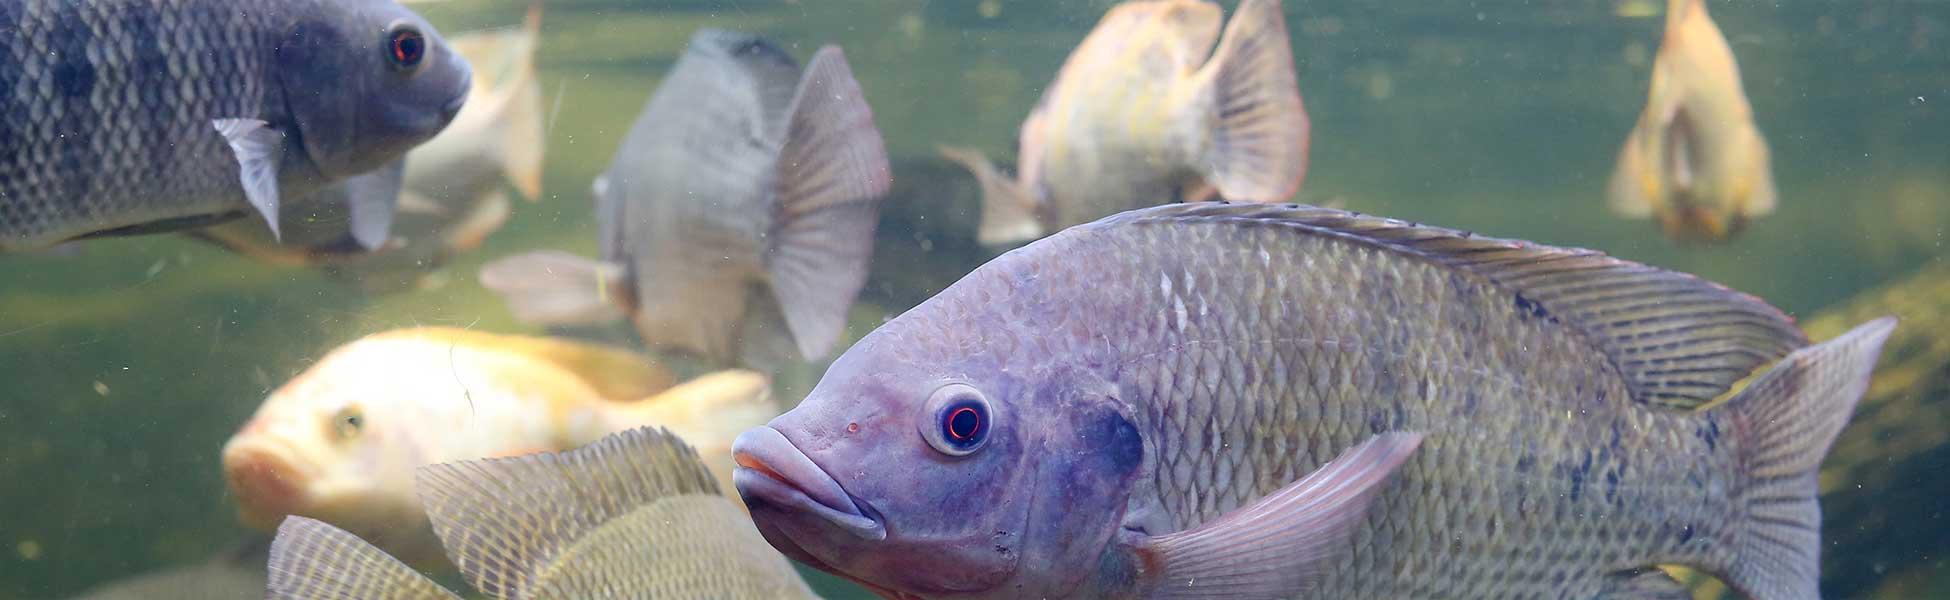 Aquaponics Symbiotic Fish Tank